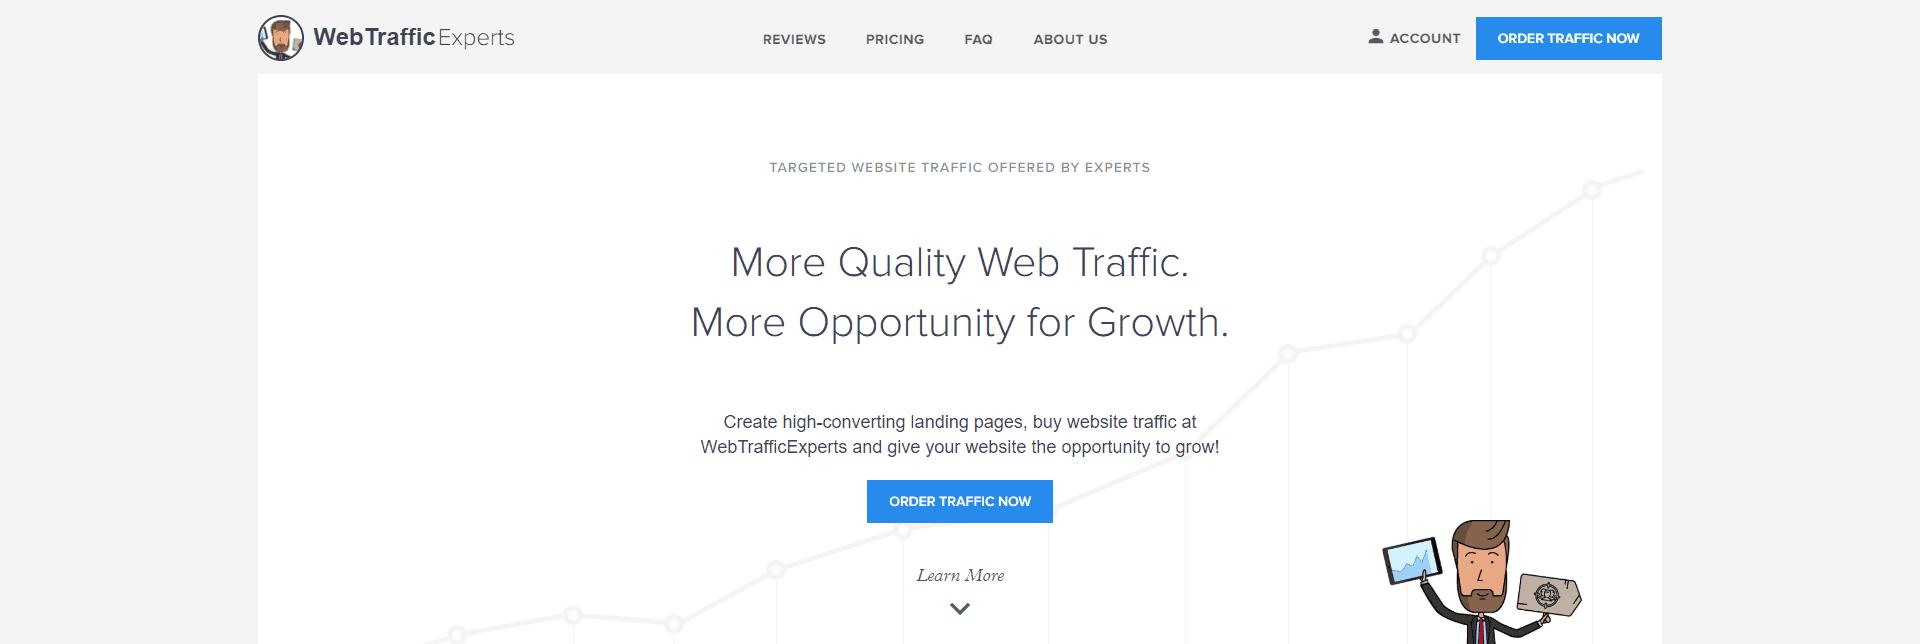 Buying Traffic From BuyWebTrafficExperts.com